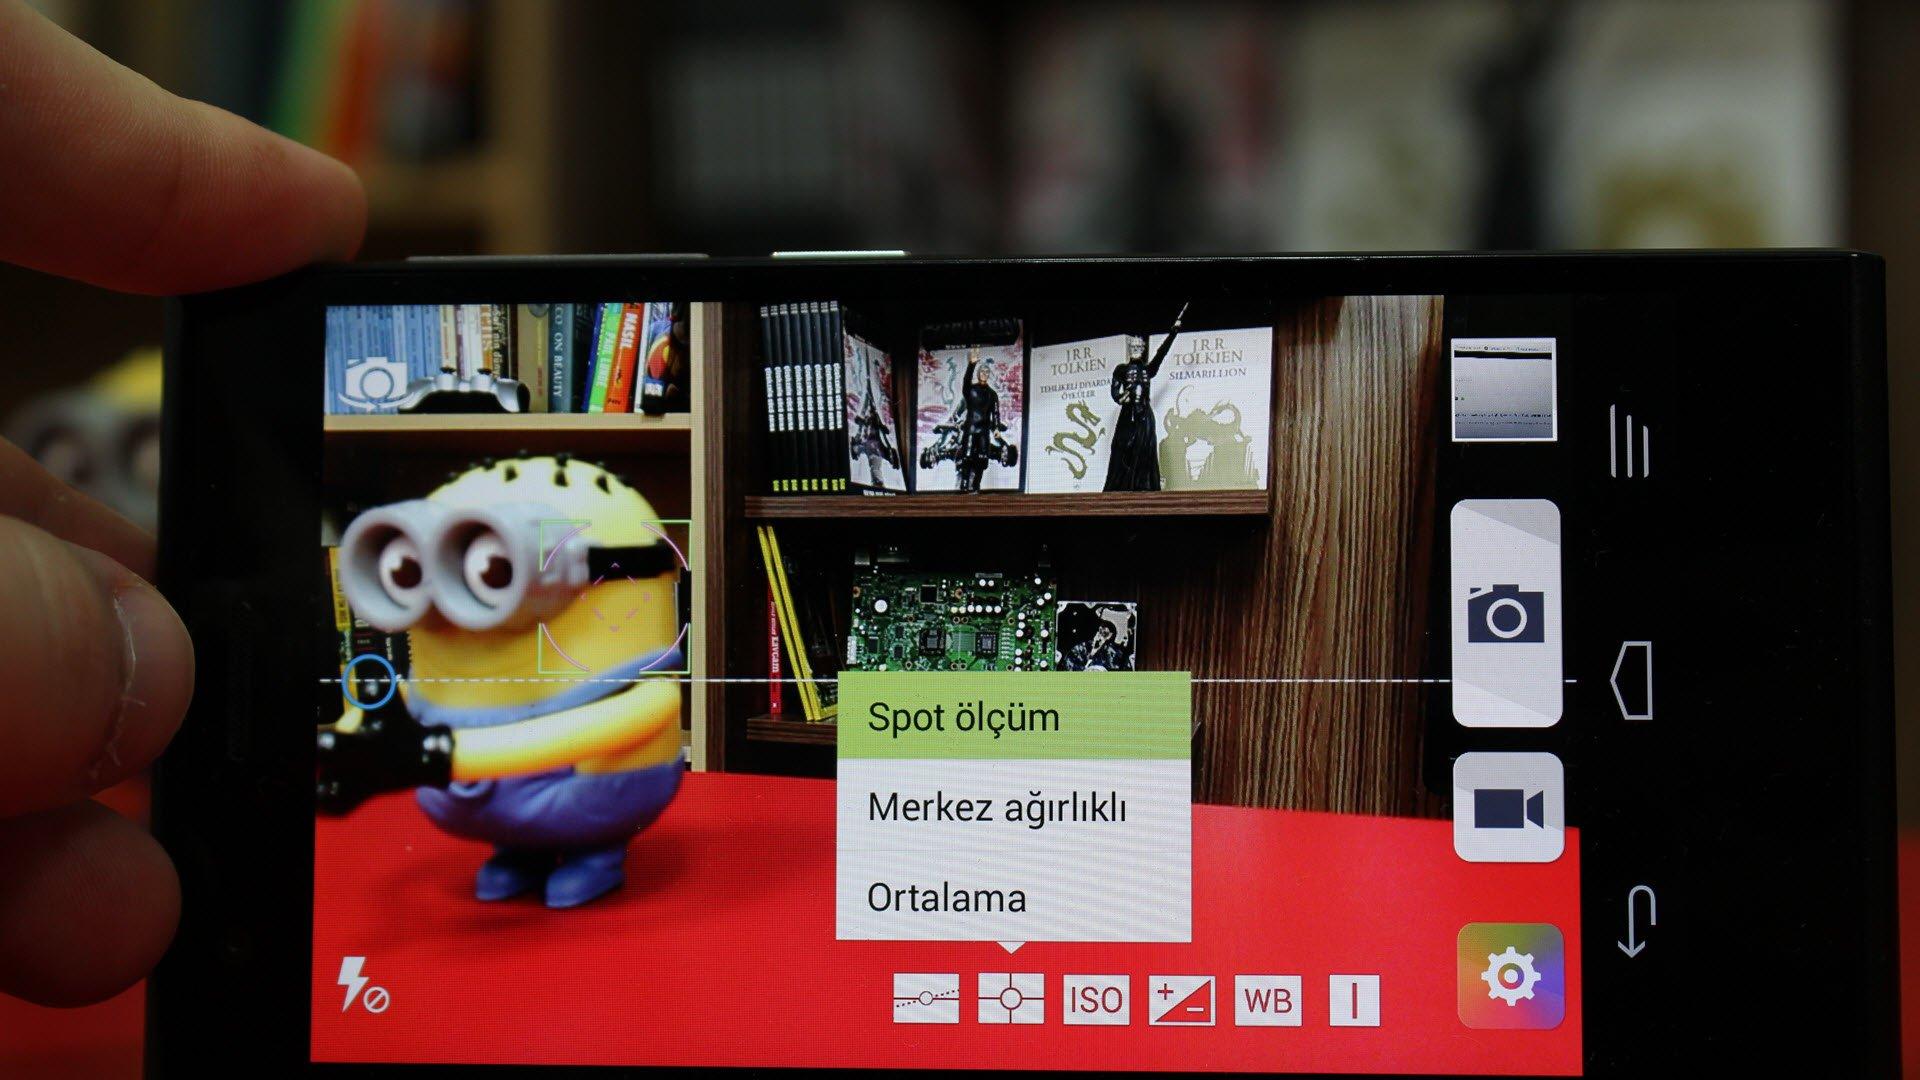 turkcell-t50-kamera-gelismis-ayarlar-spot-merkez-ortalama